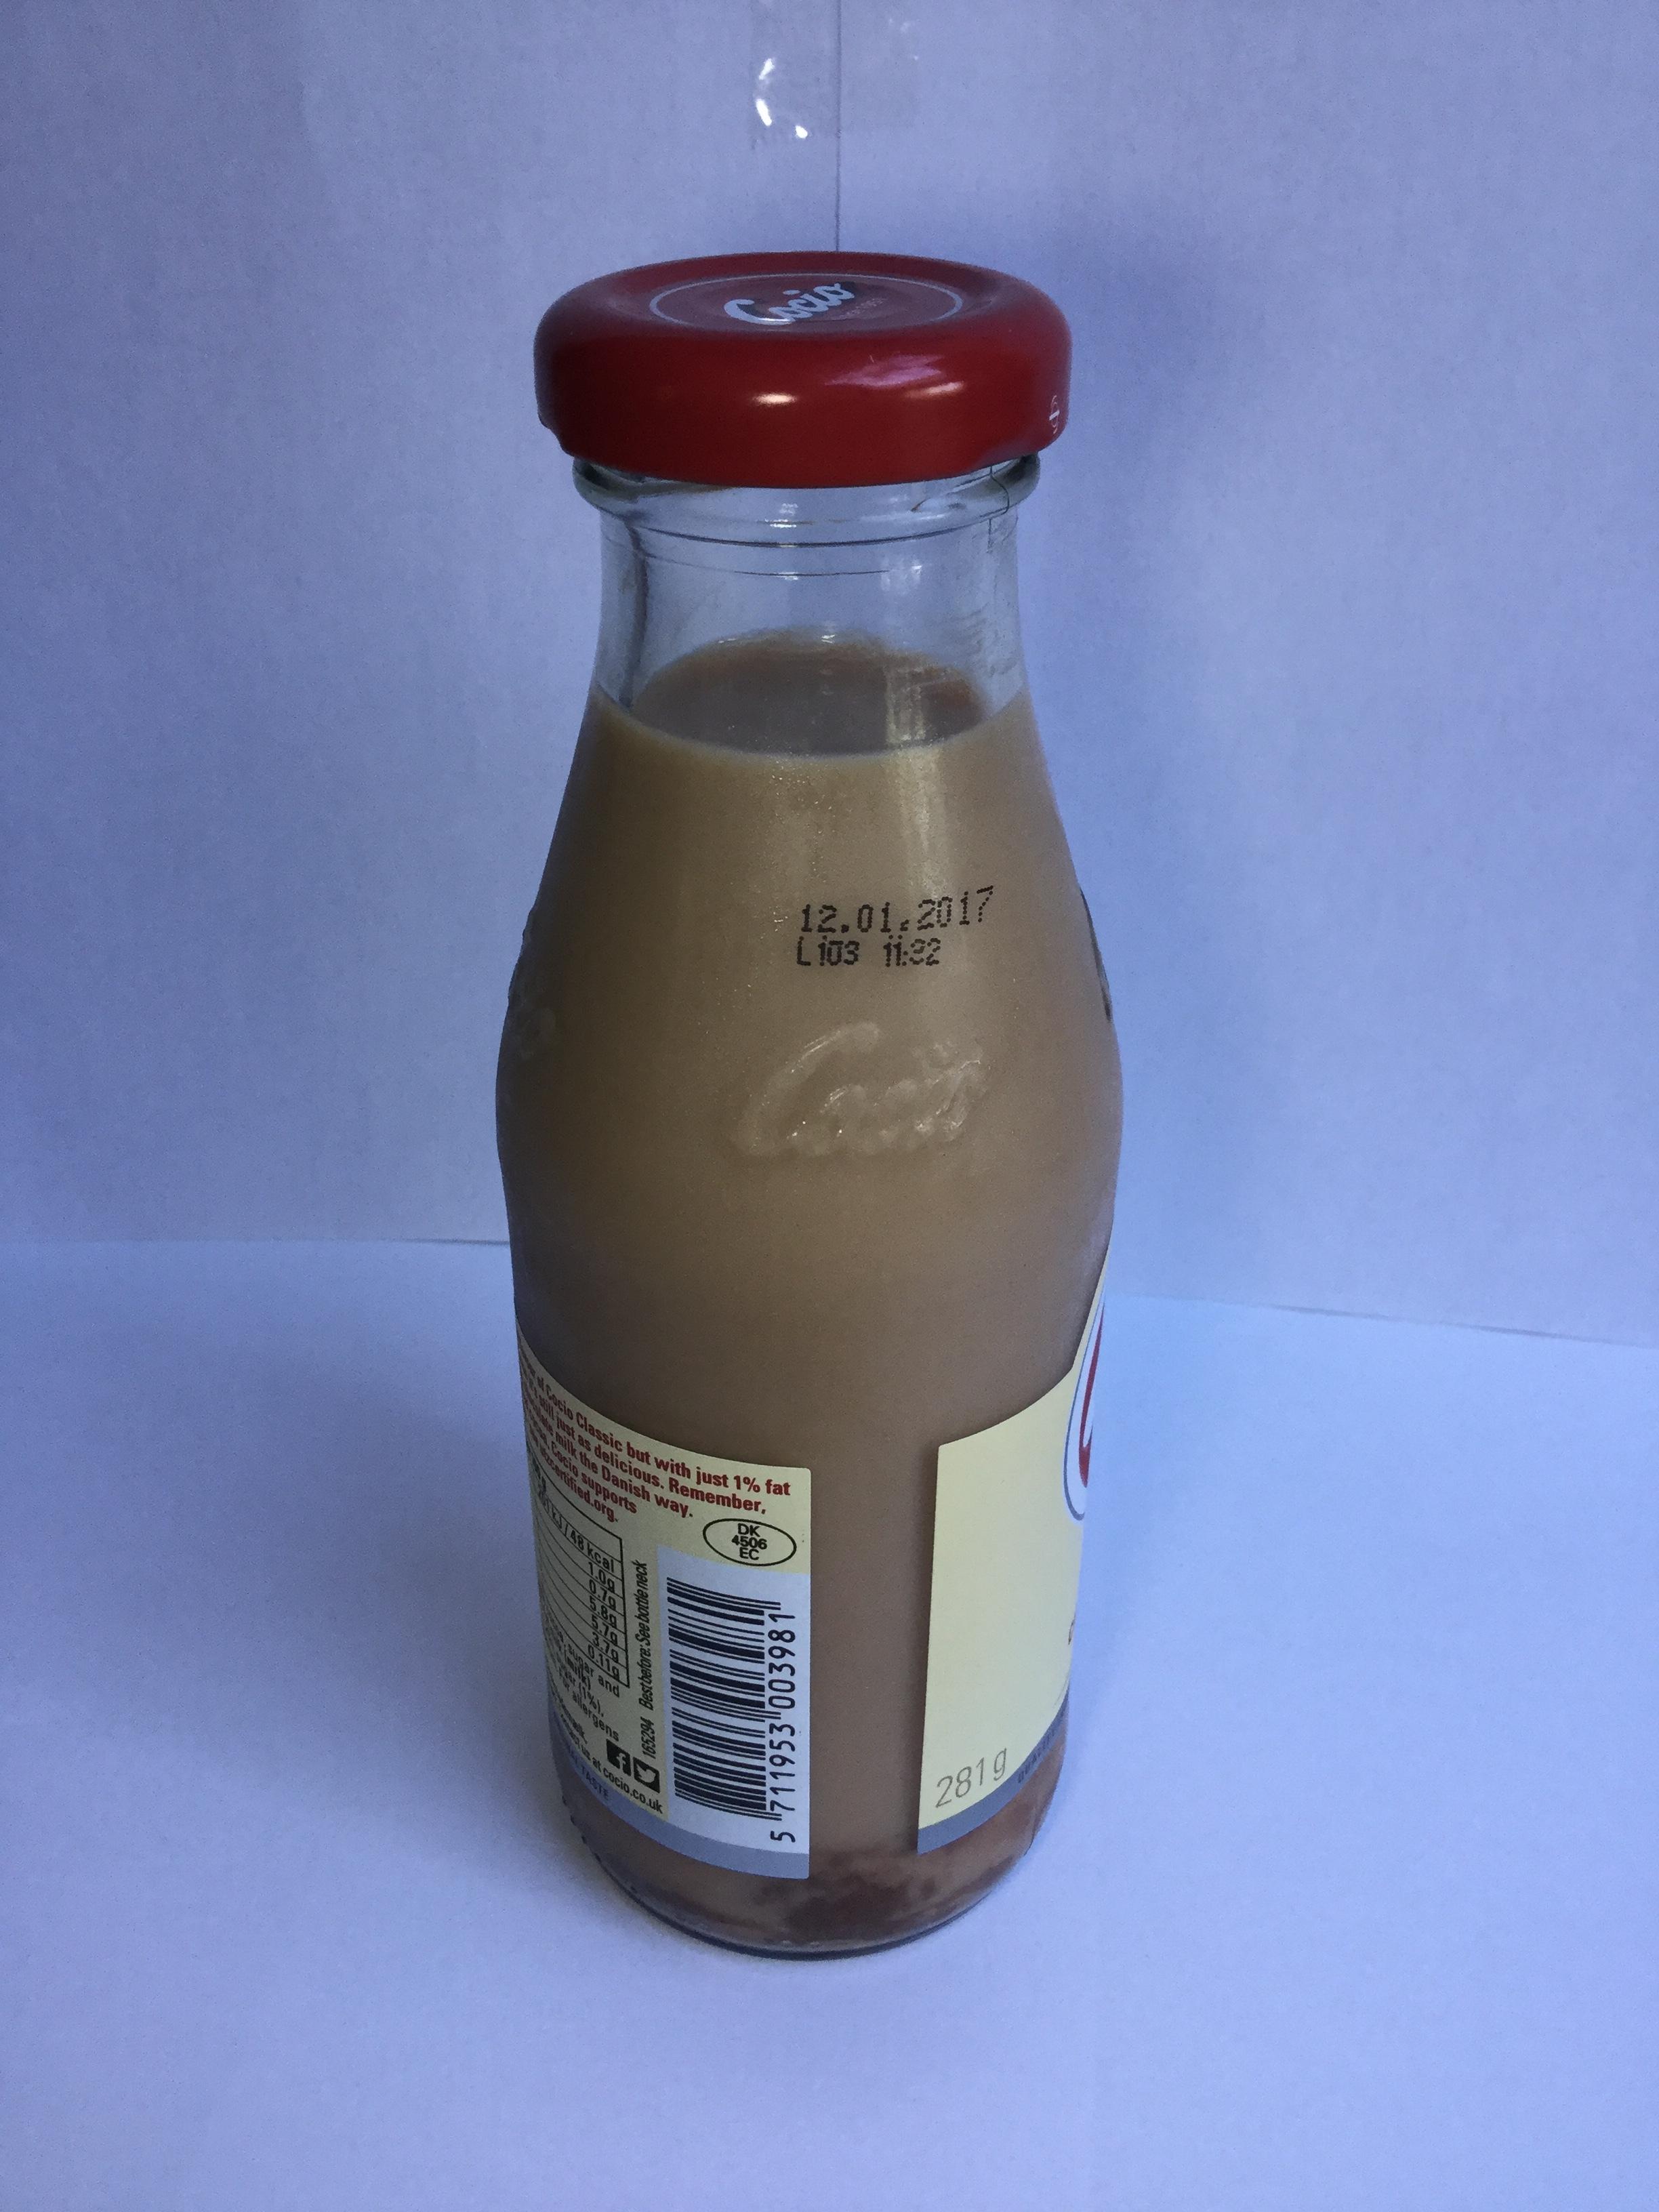 Cocio One Chocolate Milk Side 2